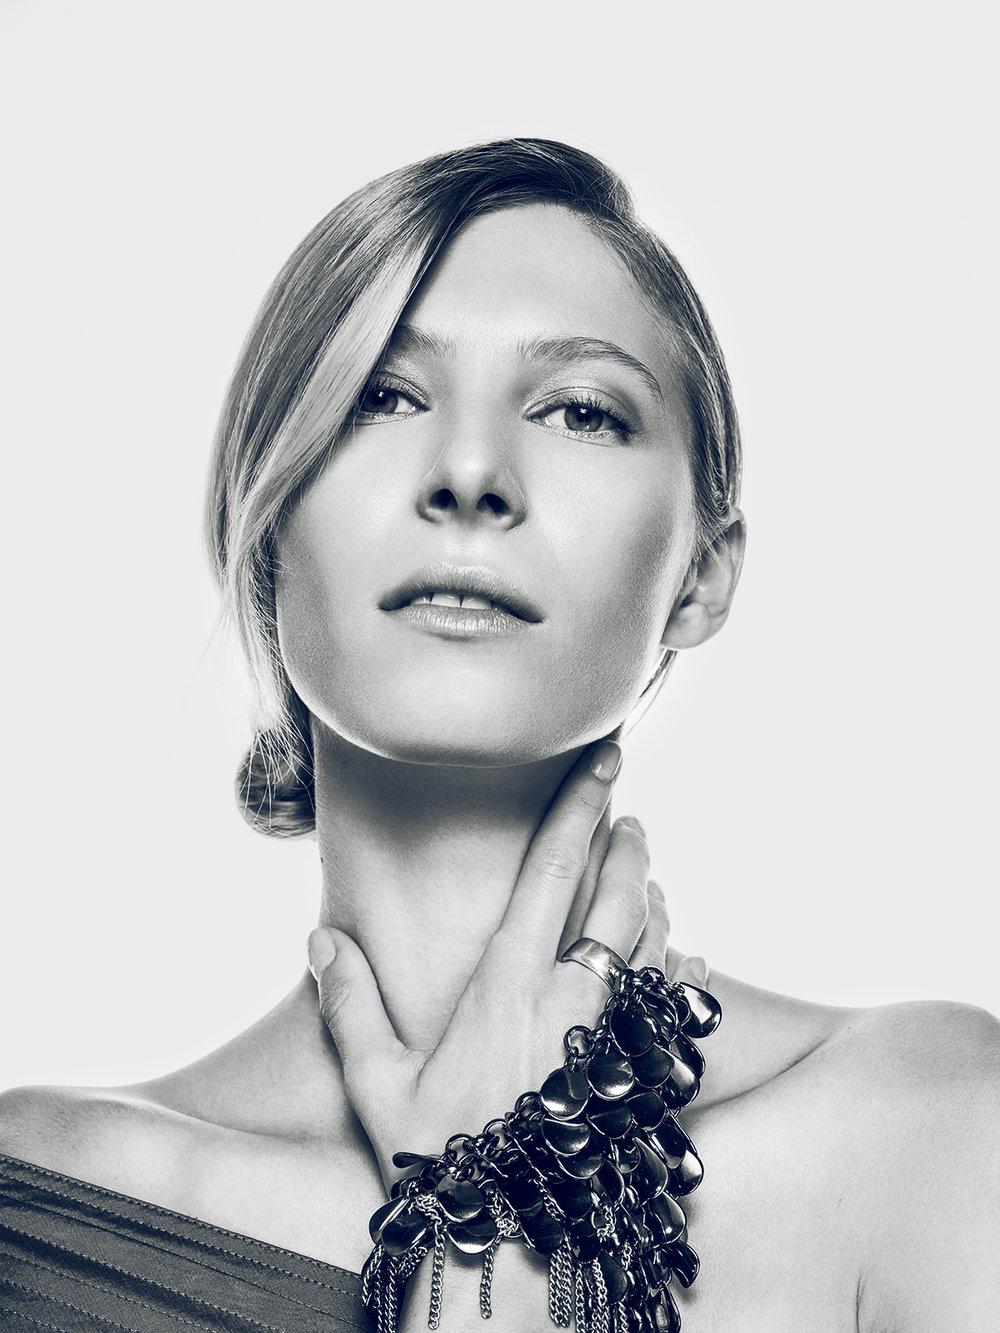 Oscar-arribas-photography-fotografo-portrait-retrato-editorial-fashion-beauty-15.jpg